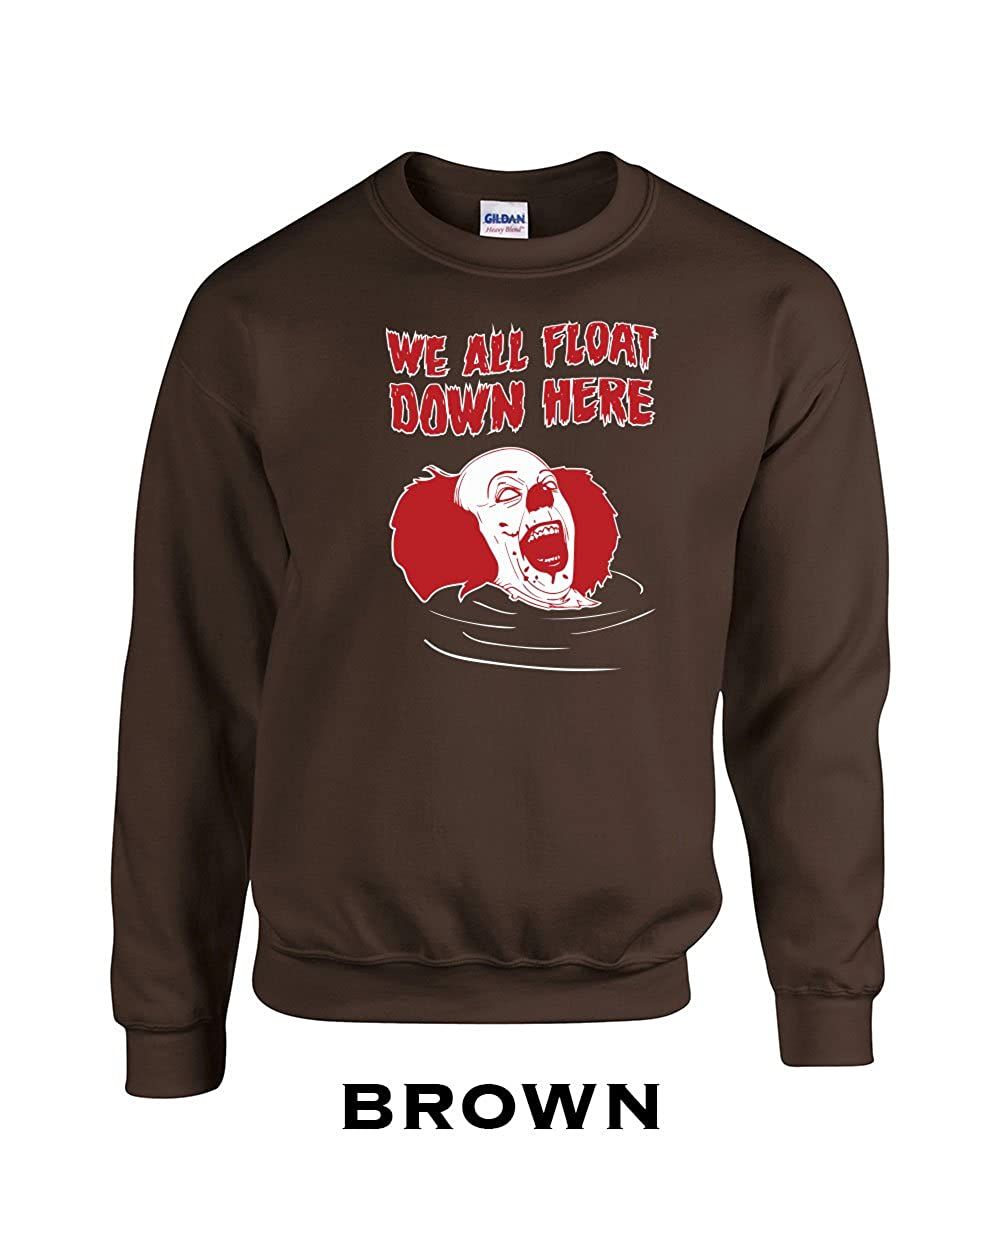 Swaffy Tees 344 We All Float Down Here Funny Adult Crew Sweatshirt